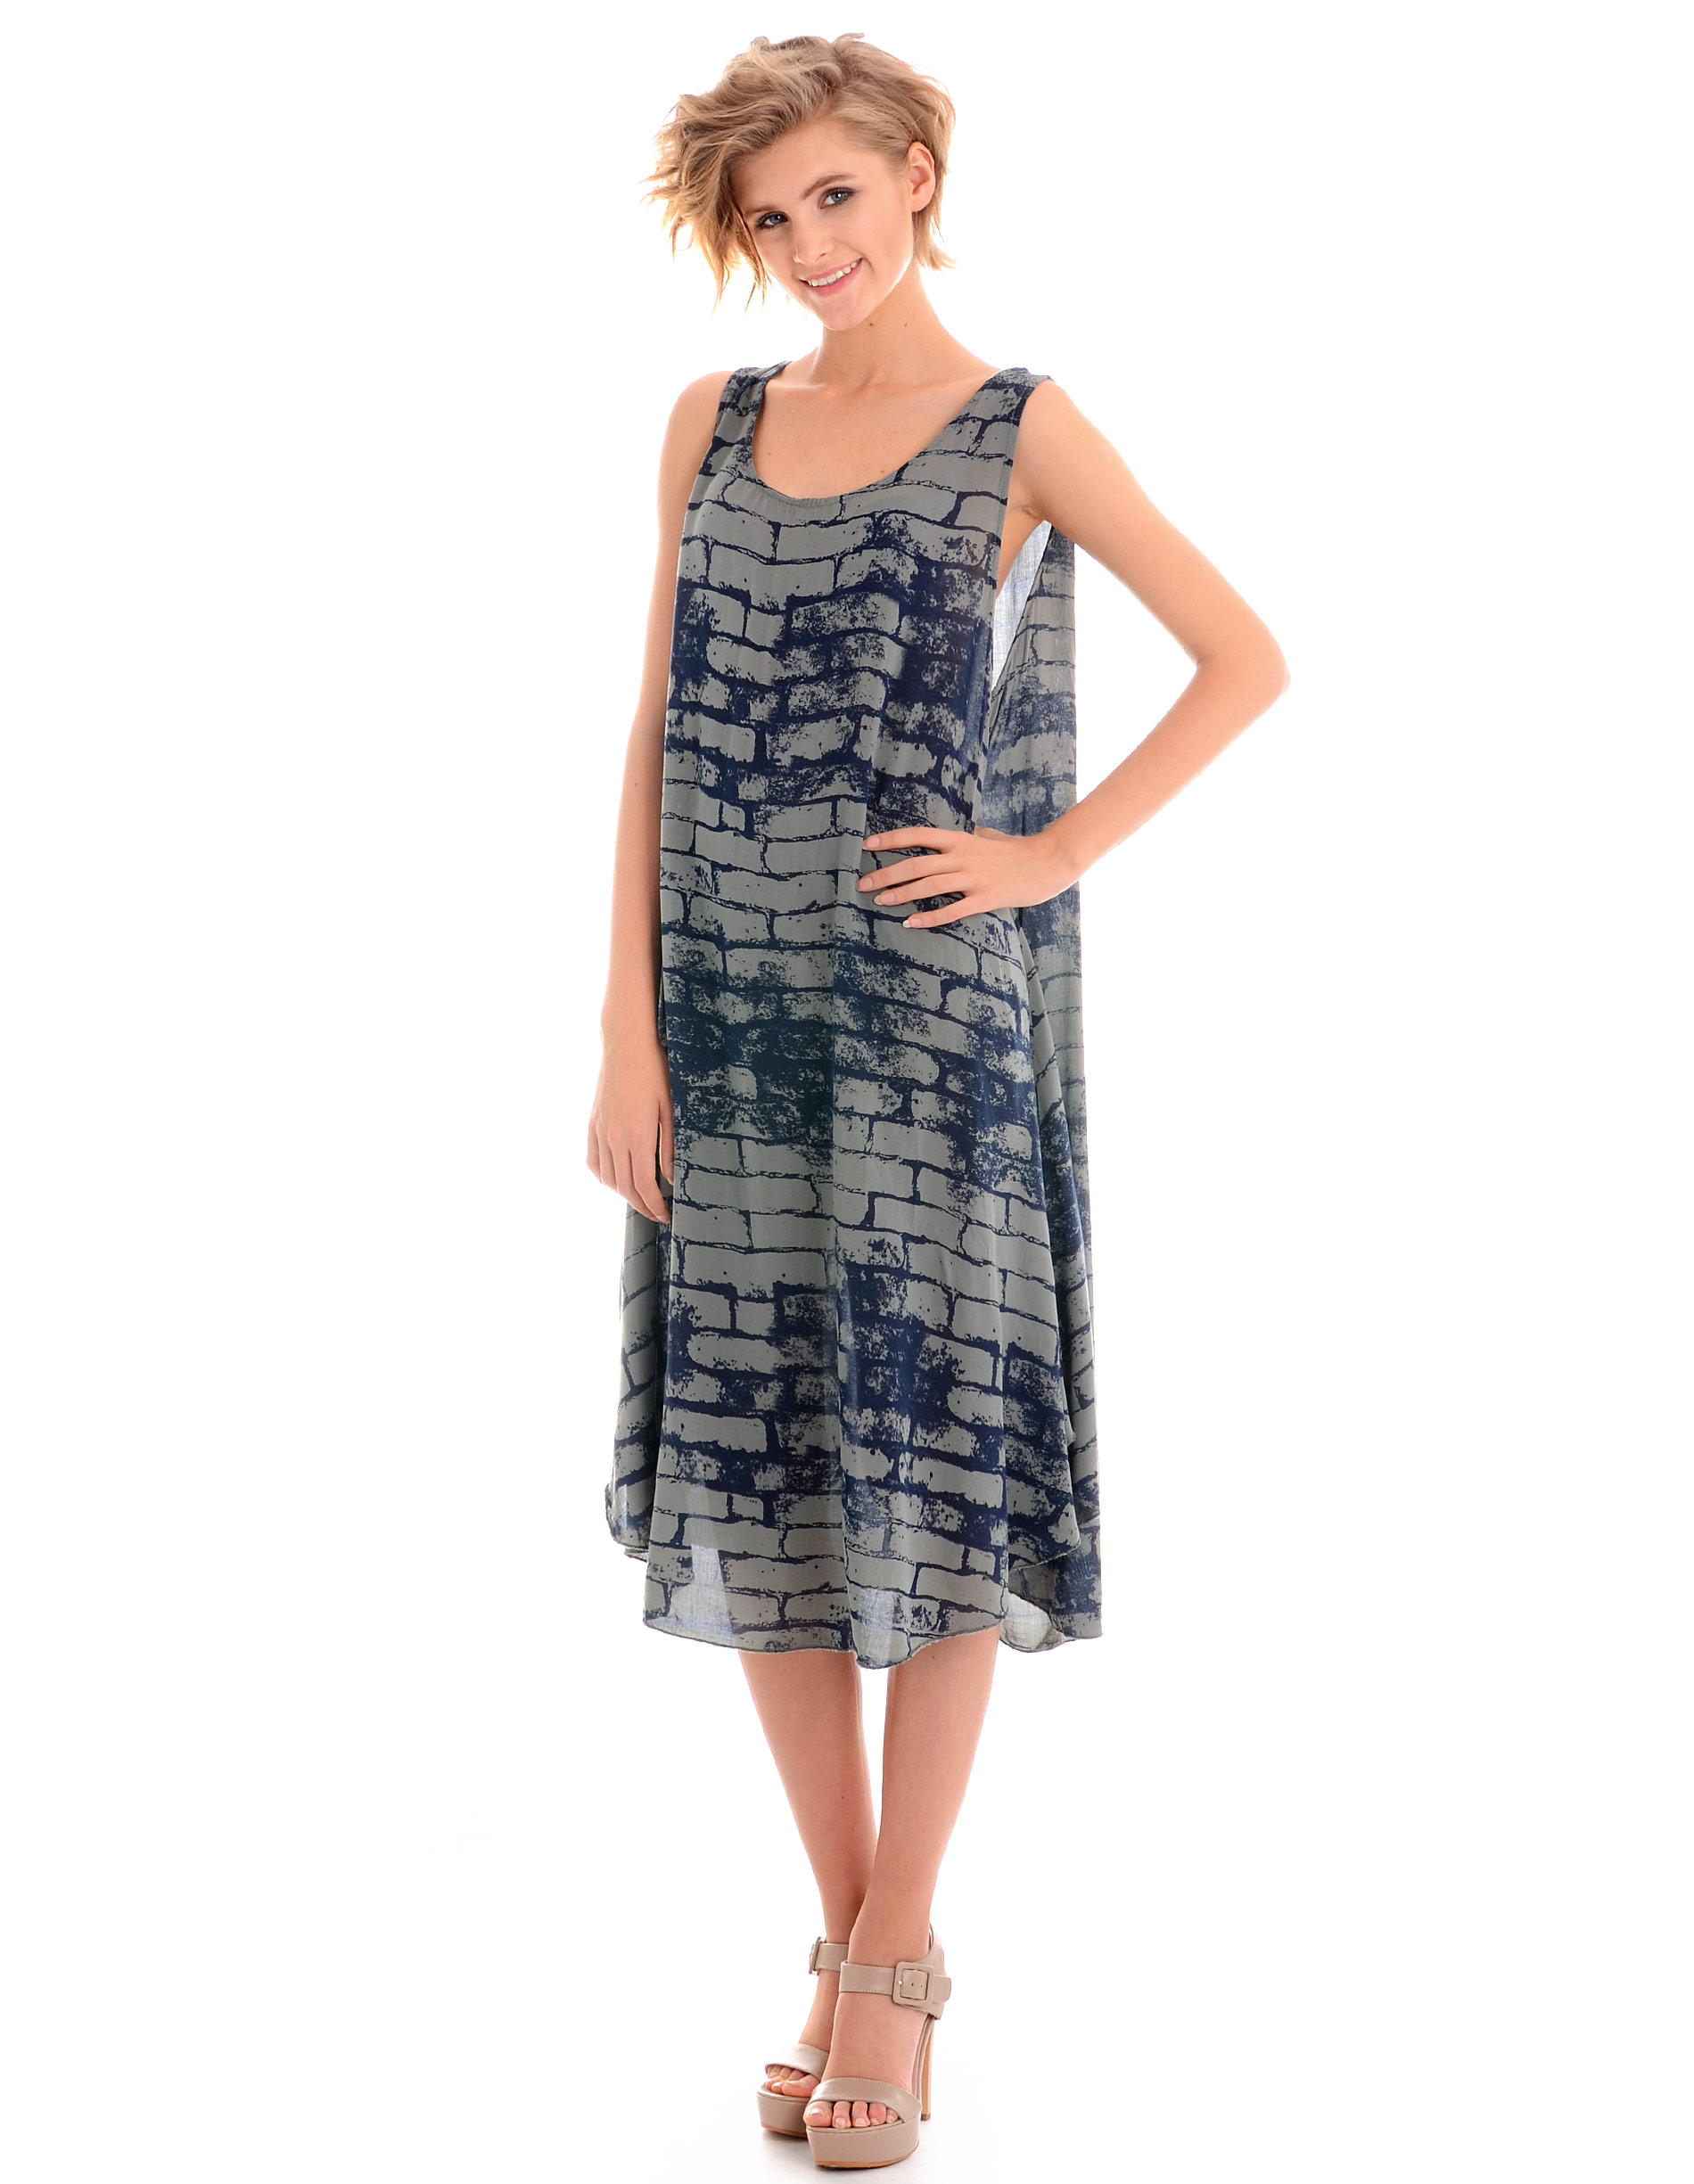 Sukienka - 15-2637 MILIT - Unisono